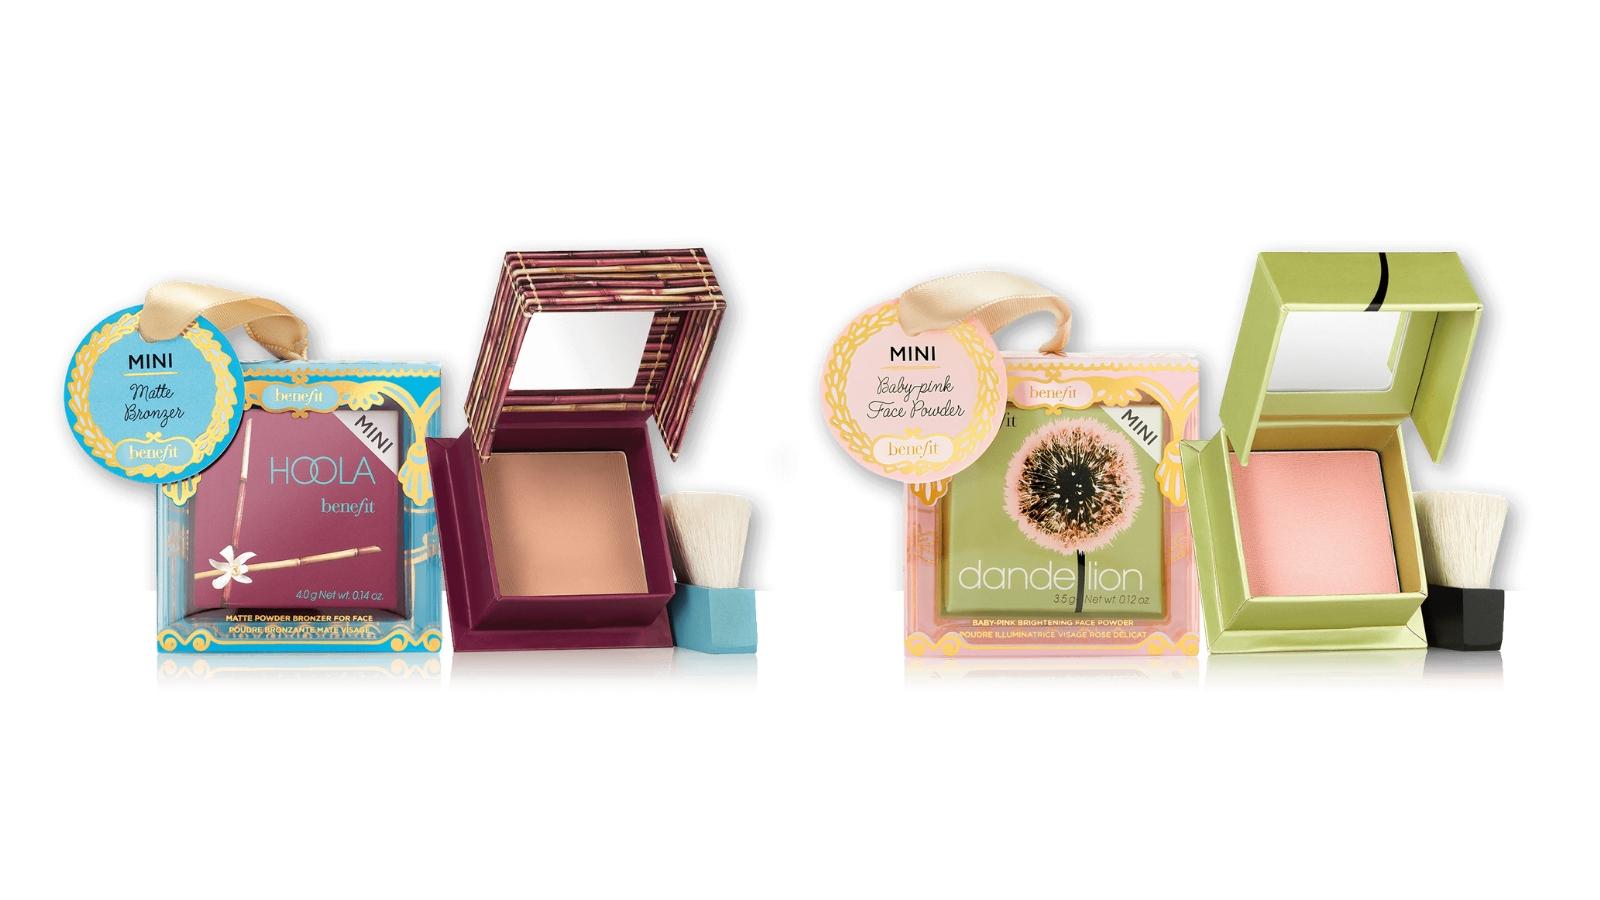 Benefit Mini box o' powder $27 each